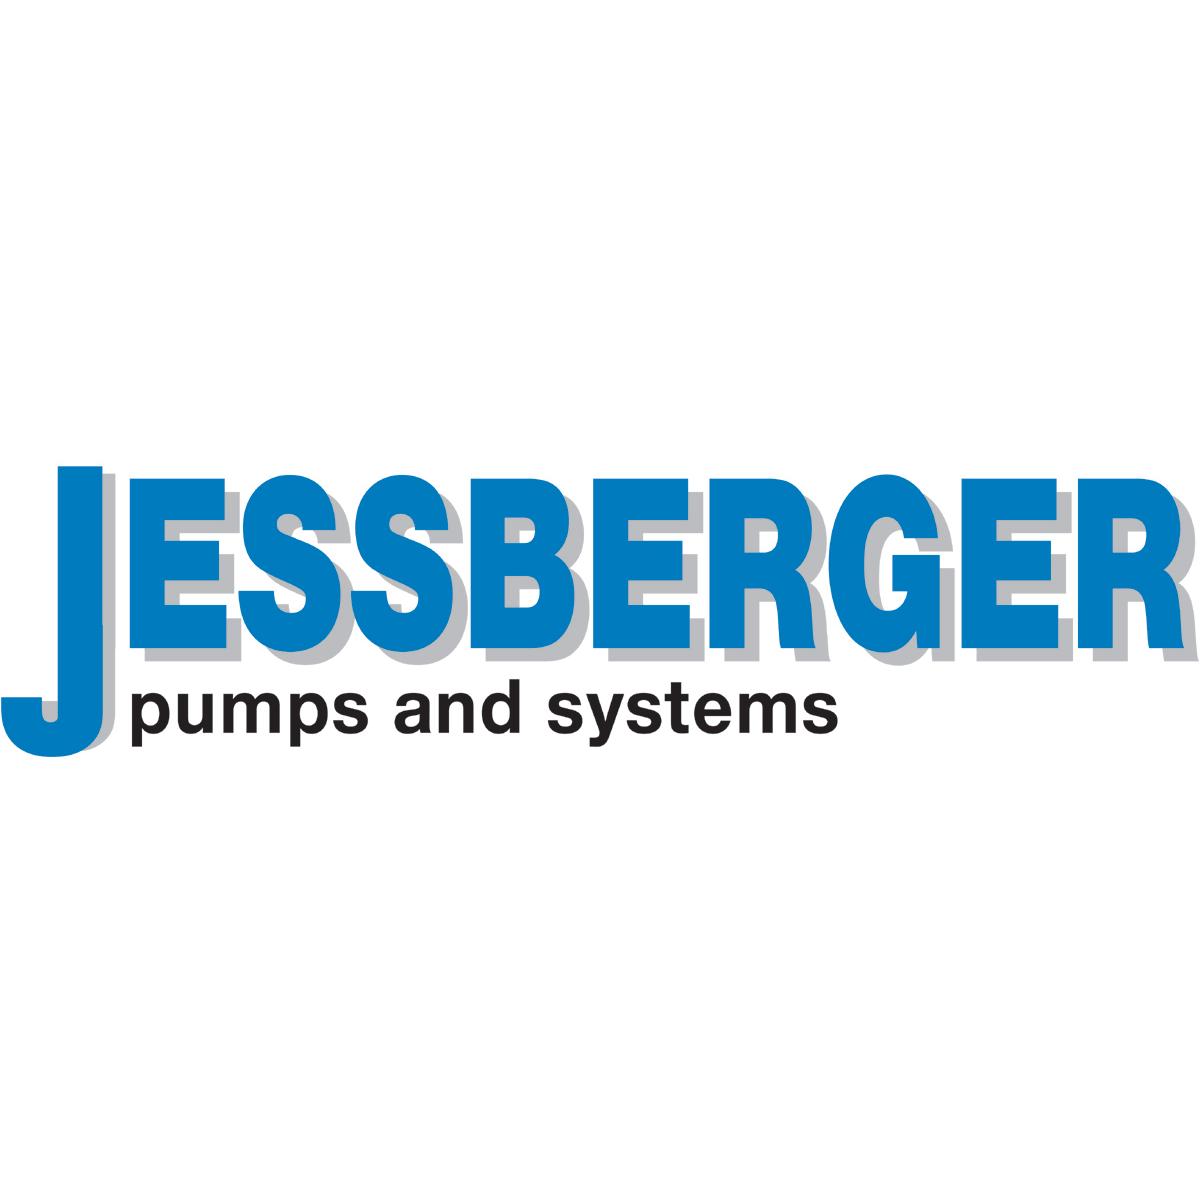 Jessberger